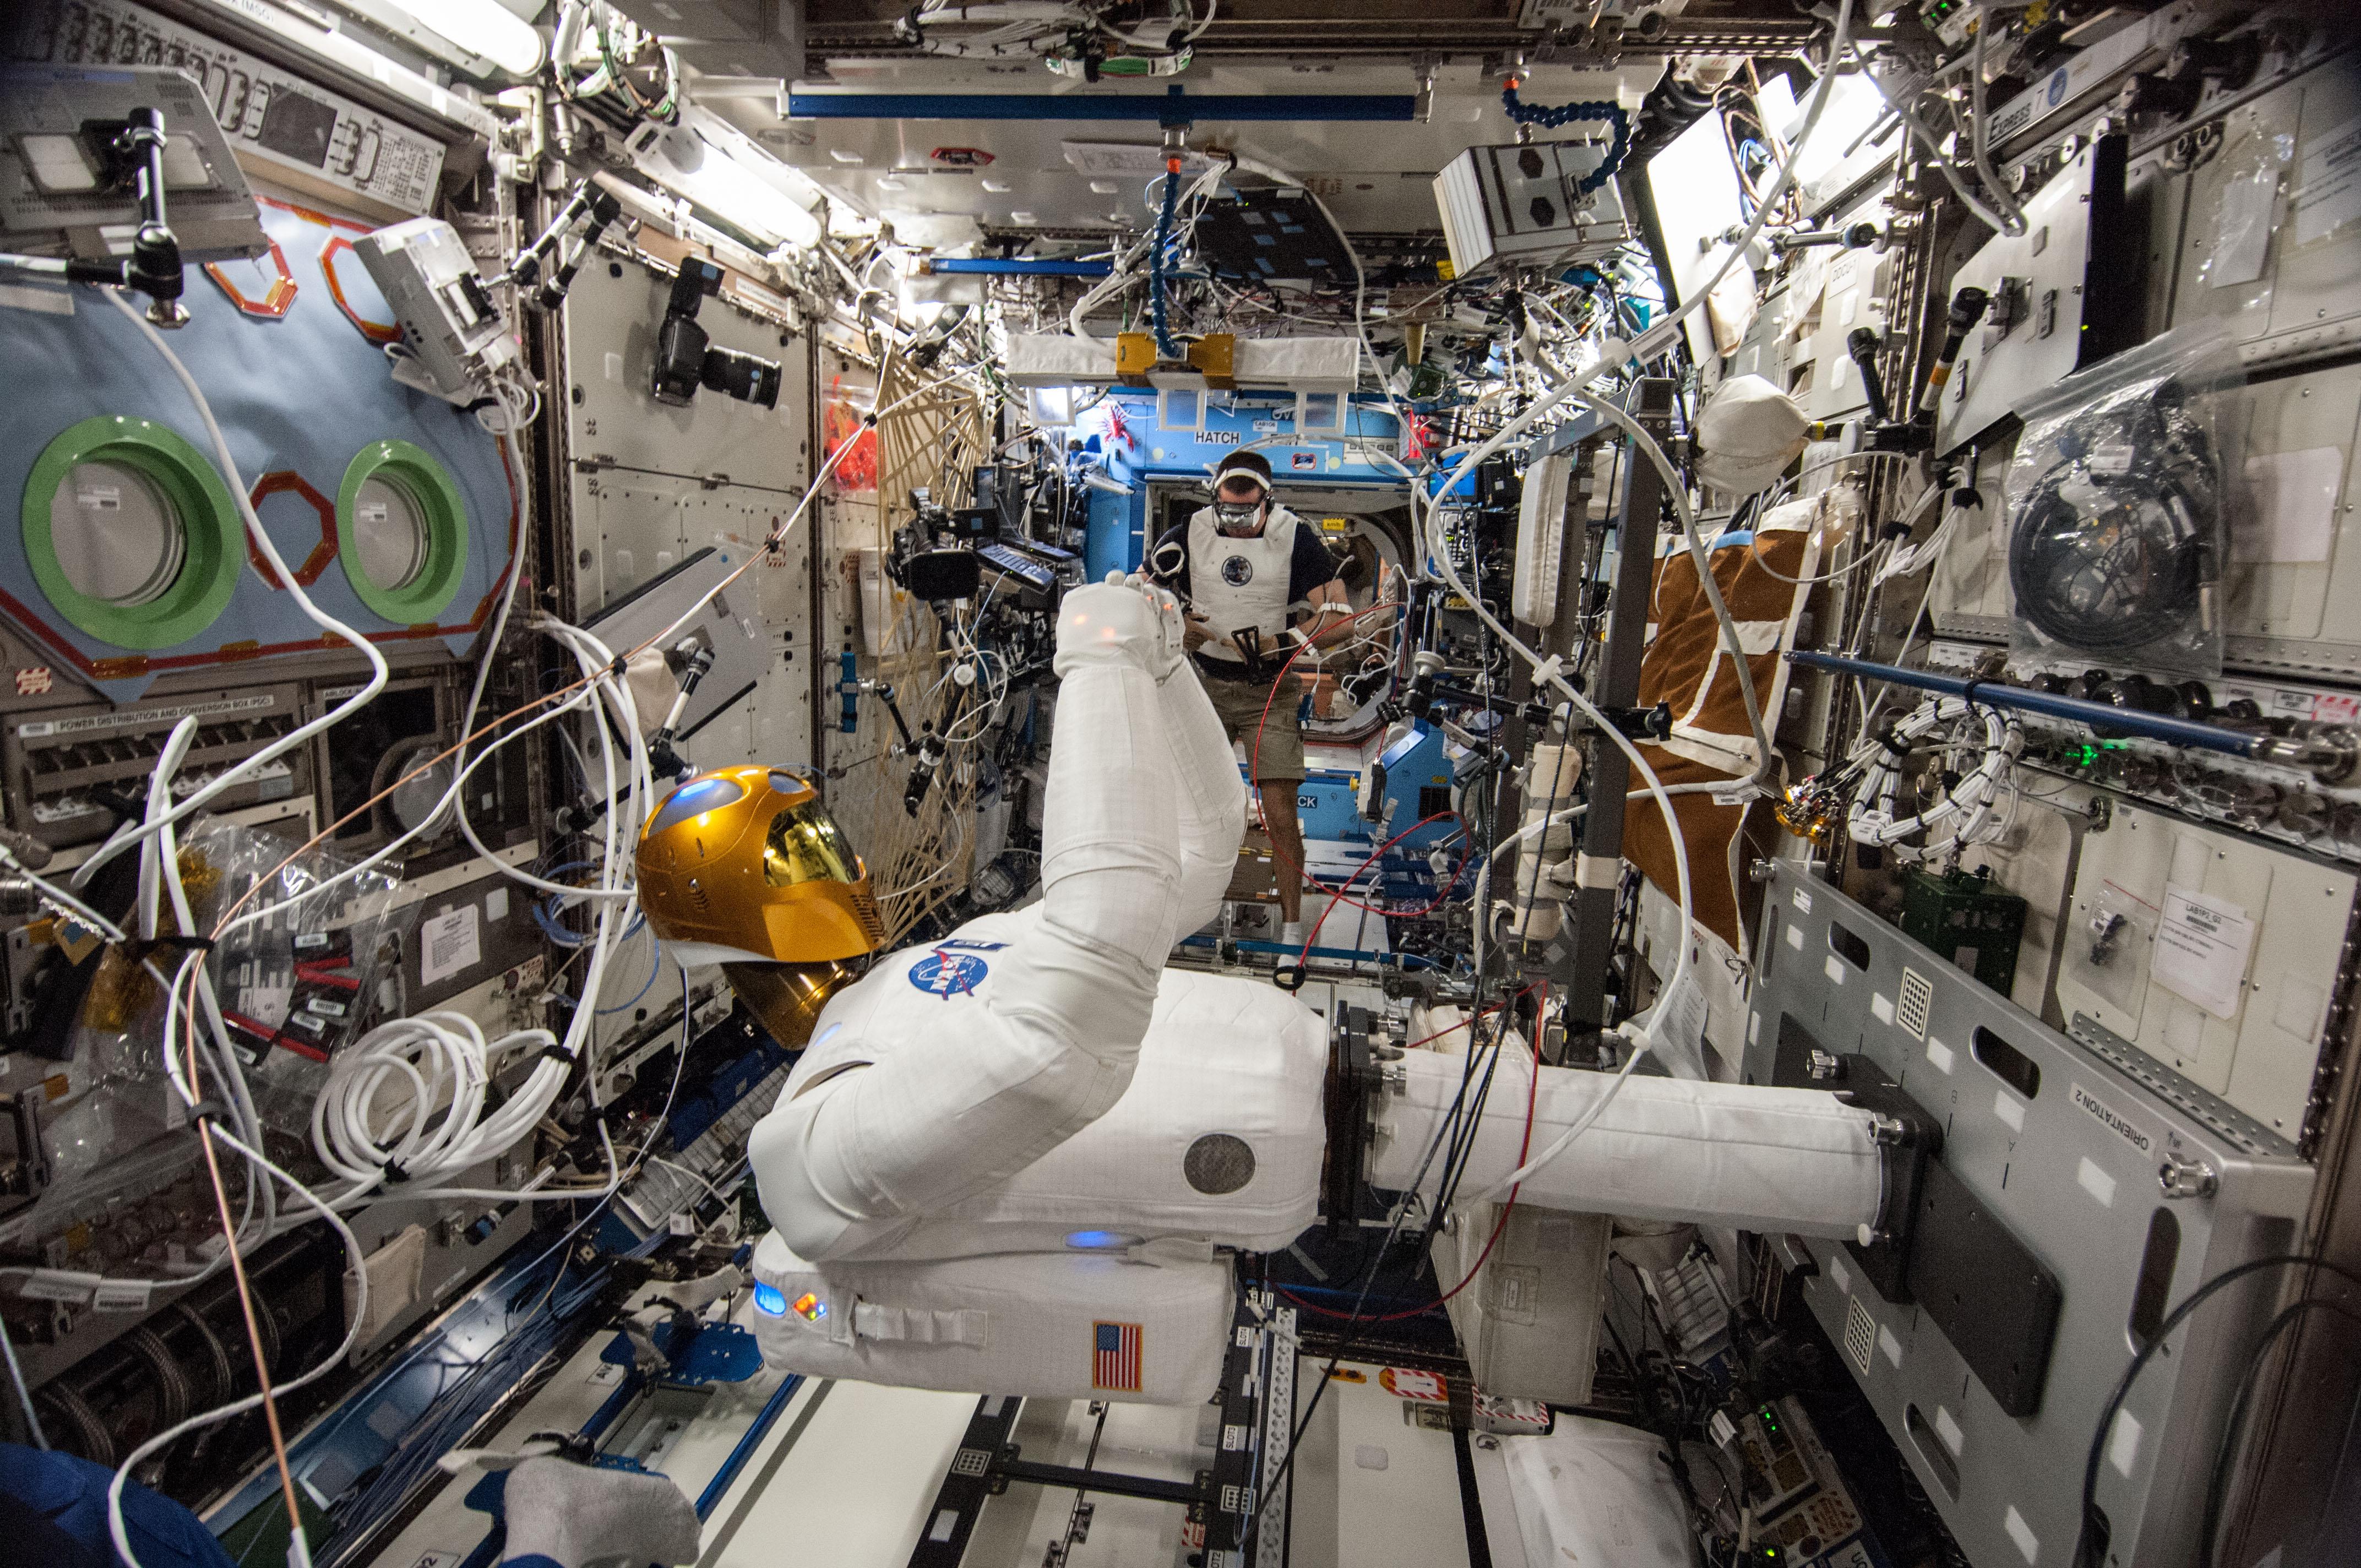 ESA Robonaut on ISS (4)